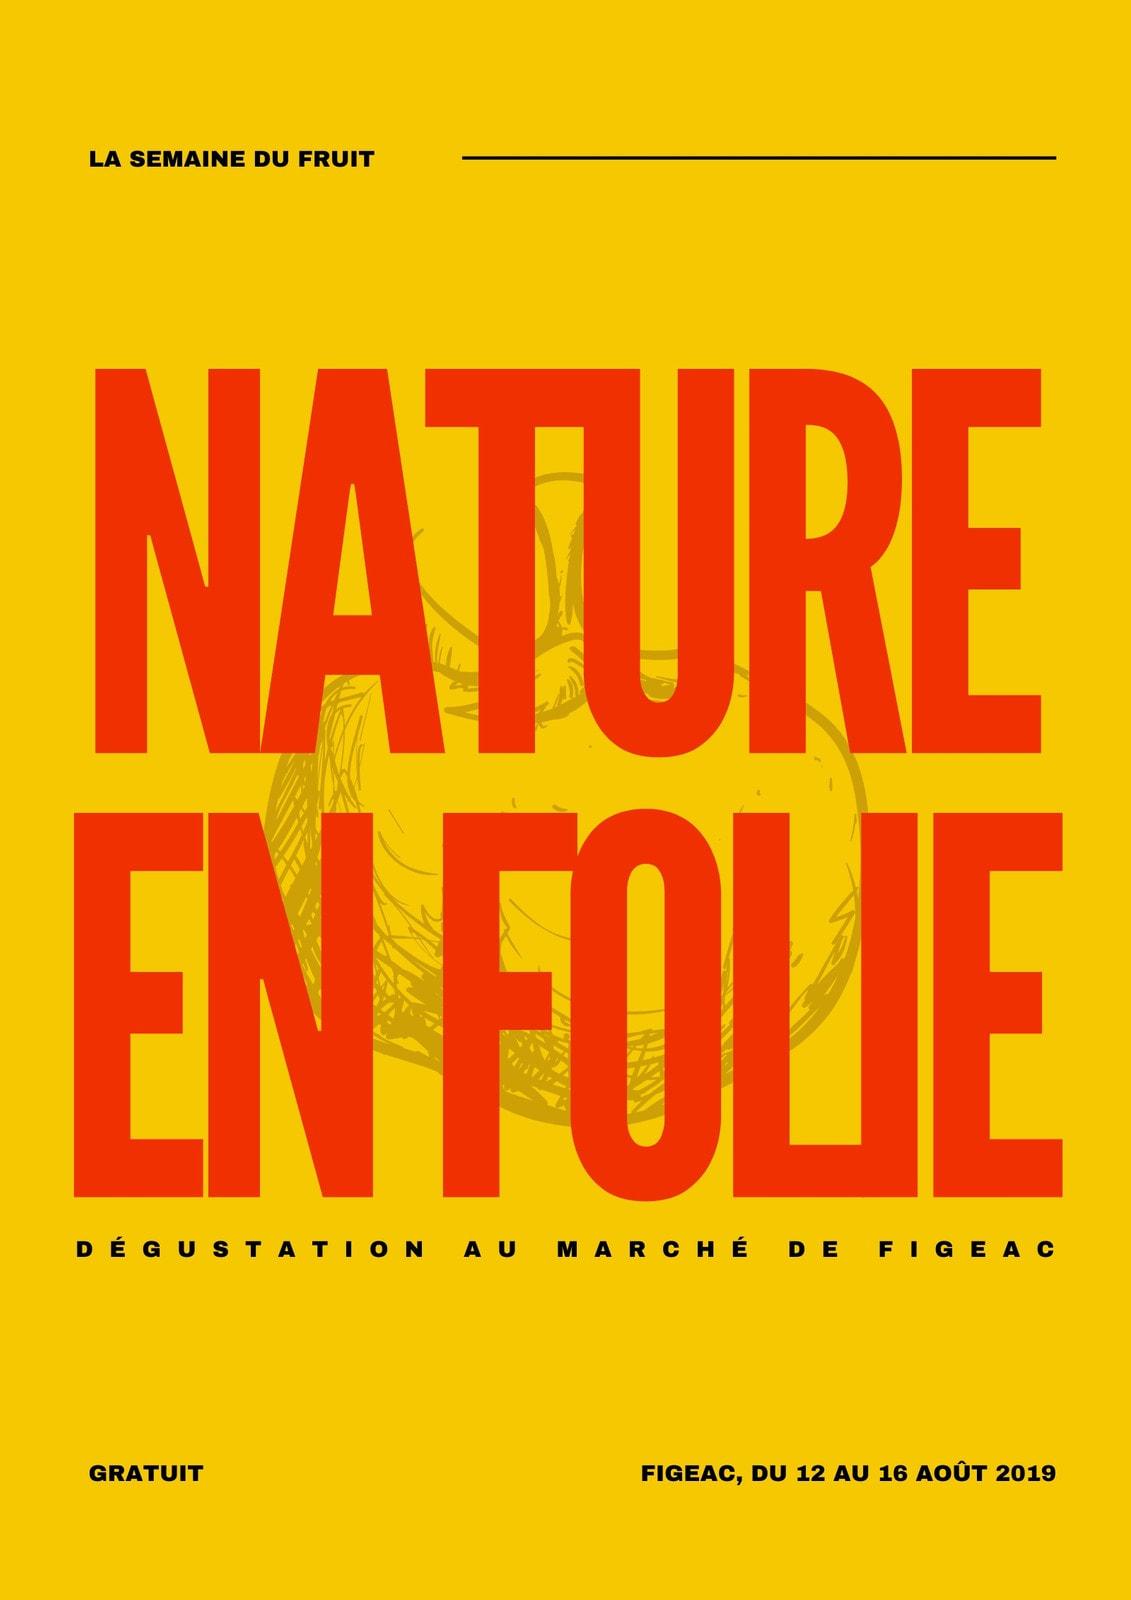 Poster marché local jaune et typographie rouge